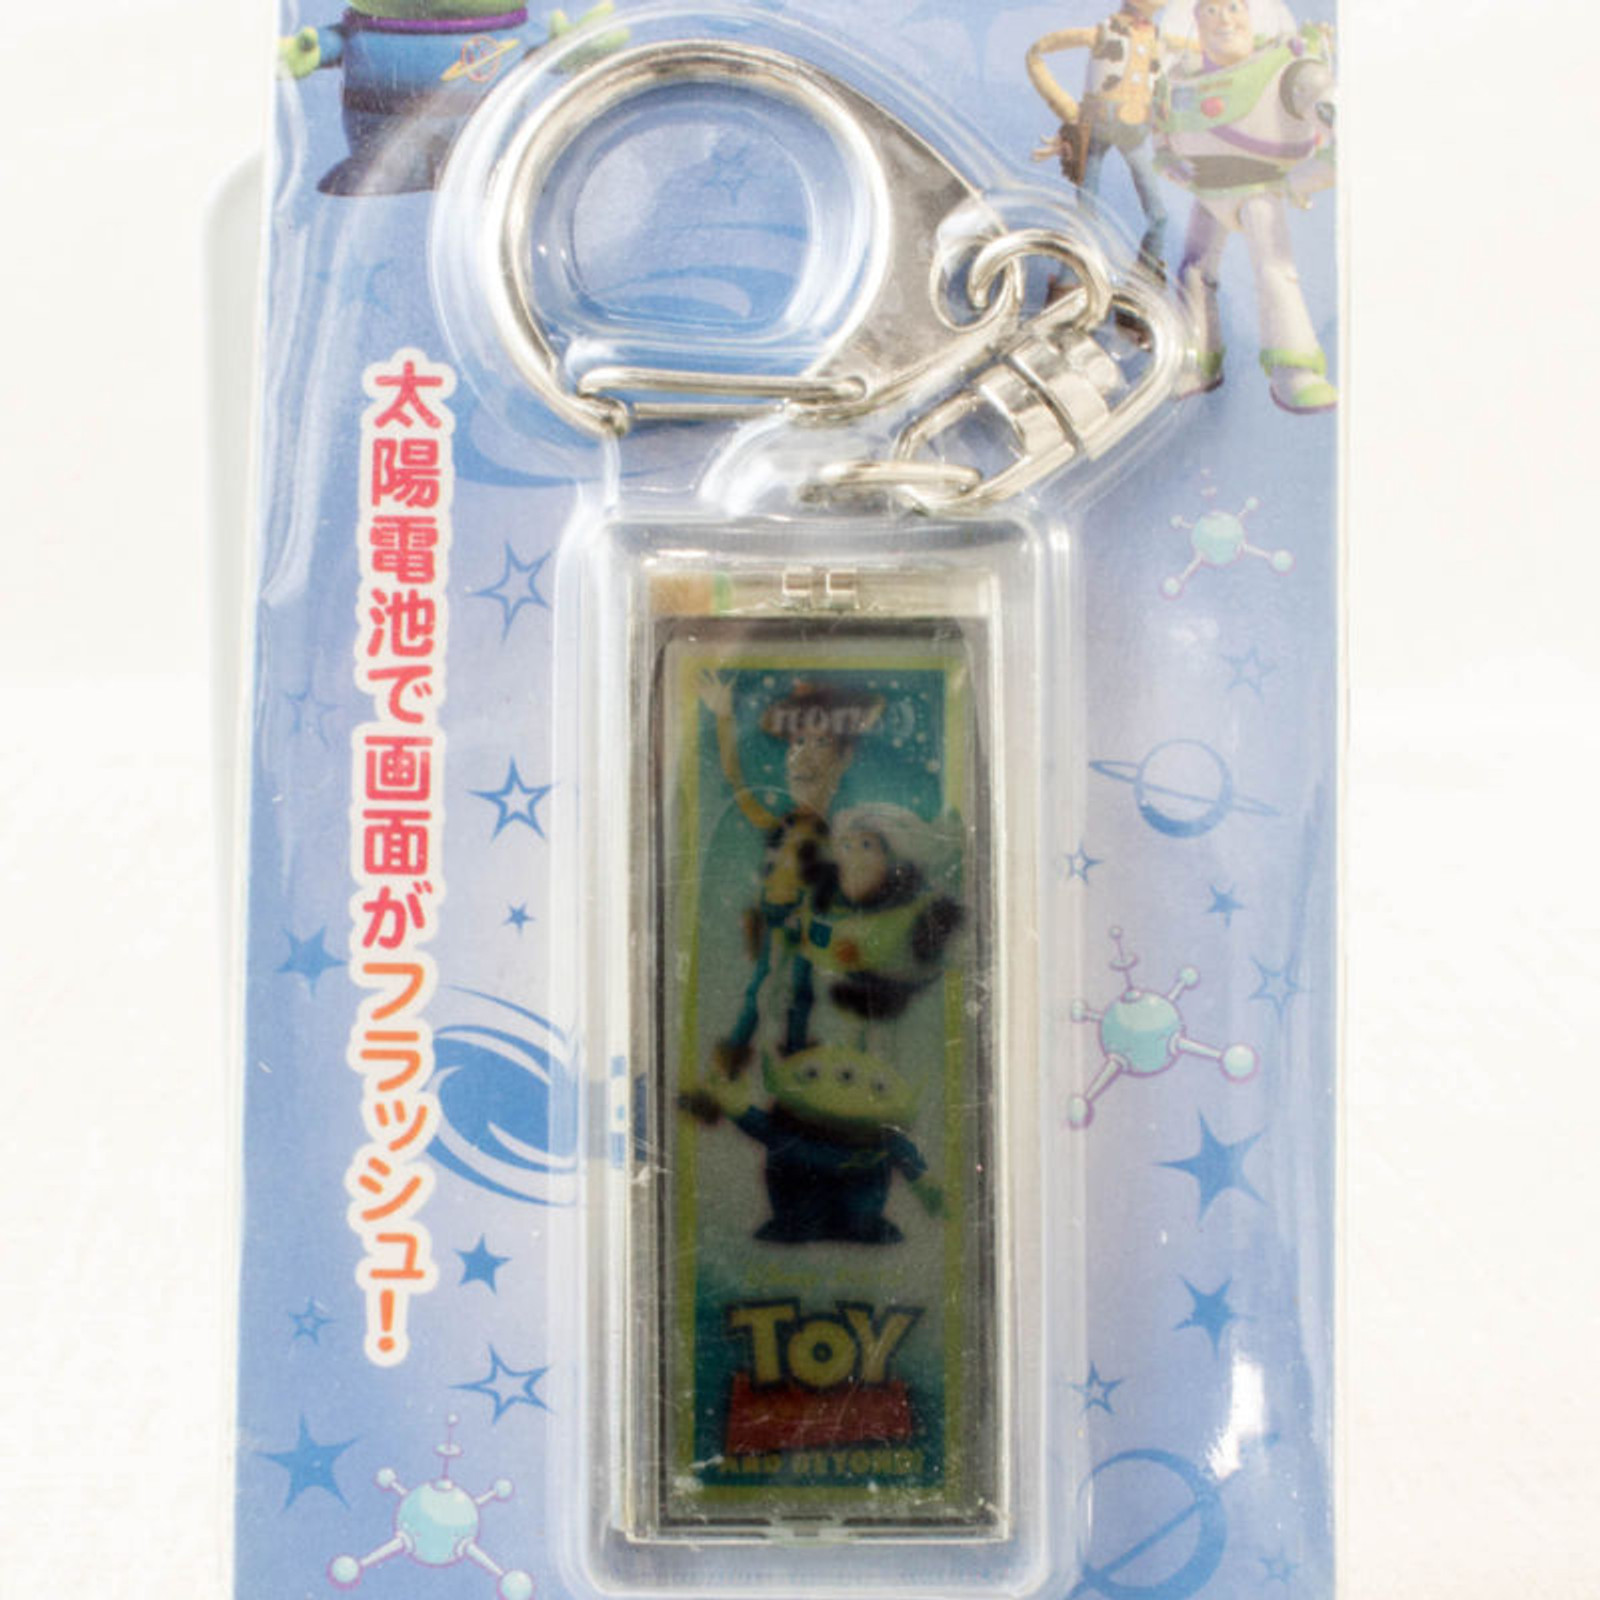 Disney Toy Story Solar Power Flash Plate Keychain RUN'A JAPAN